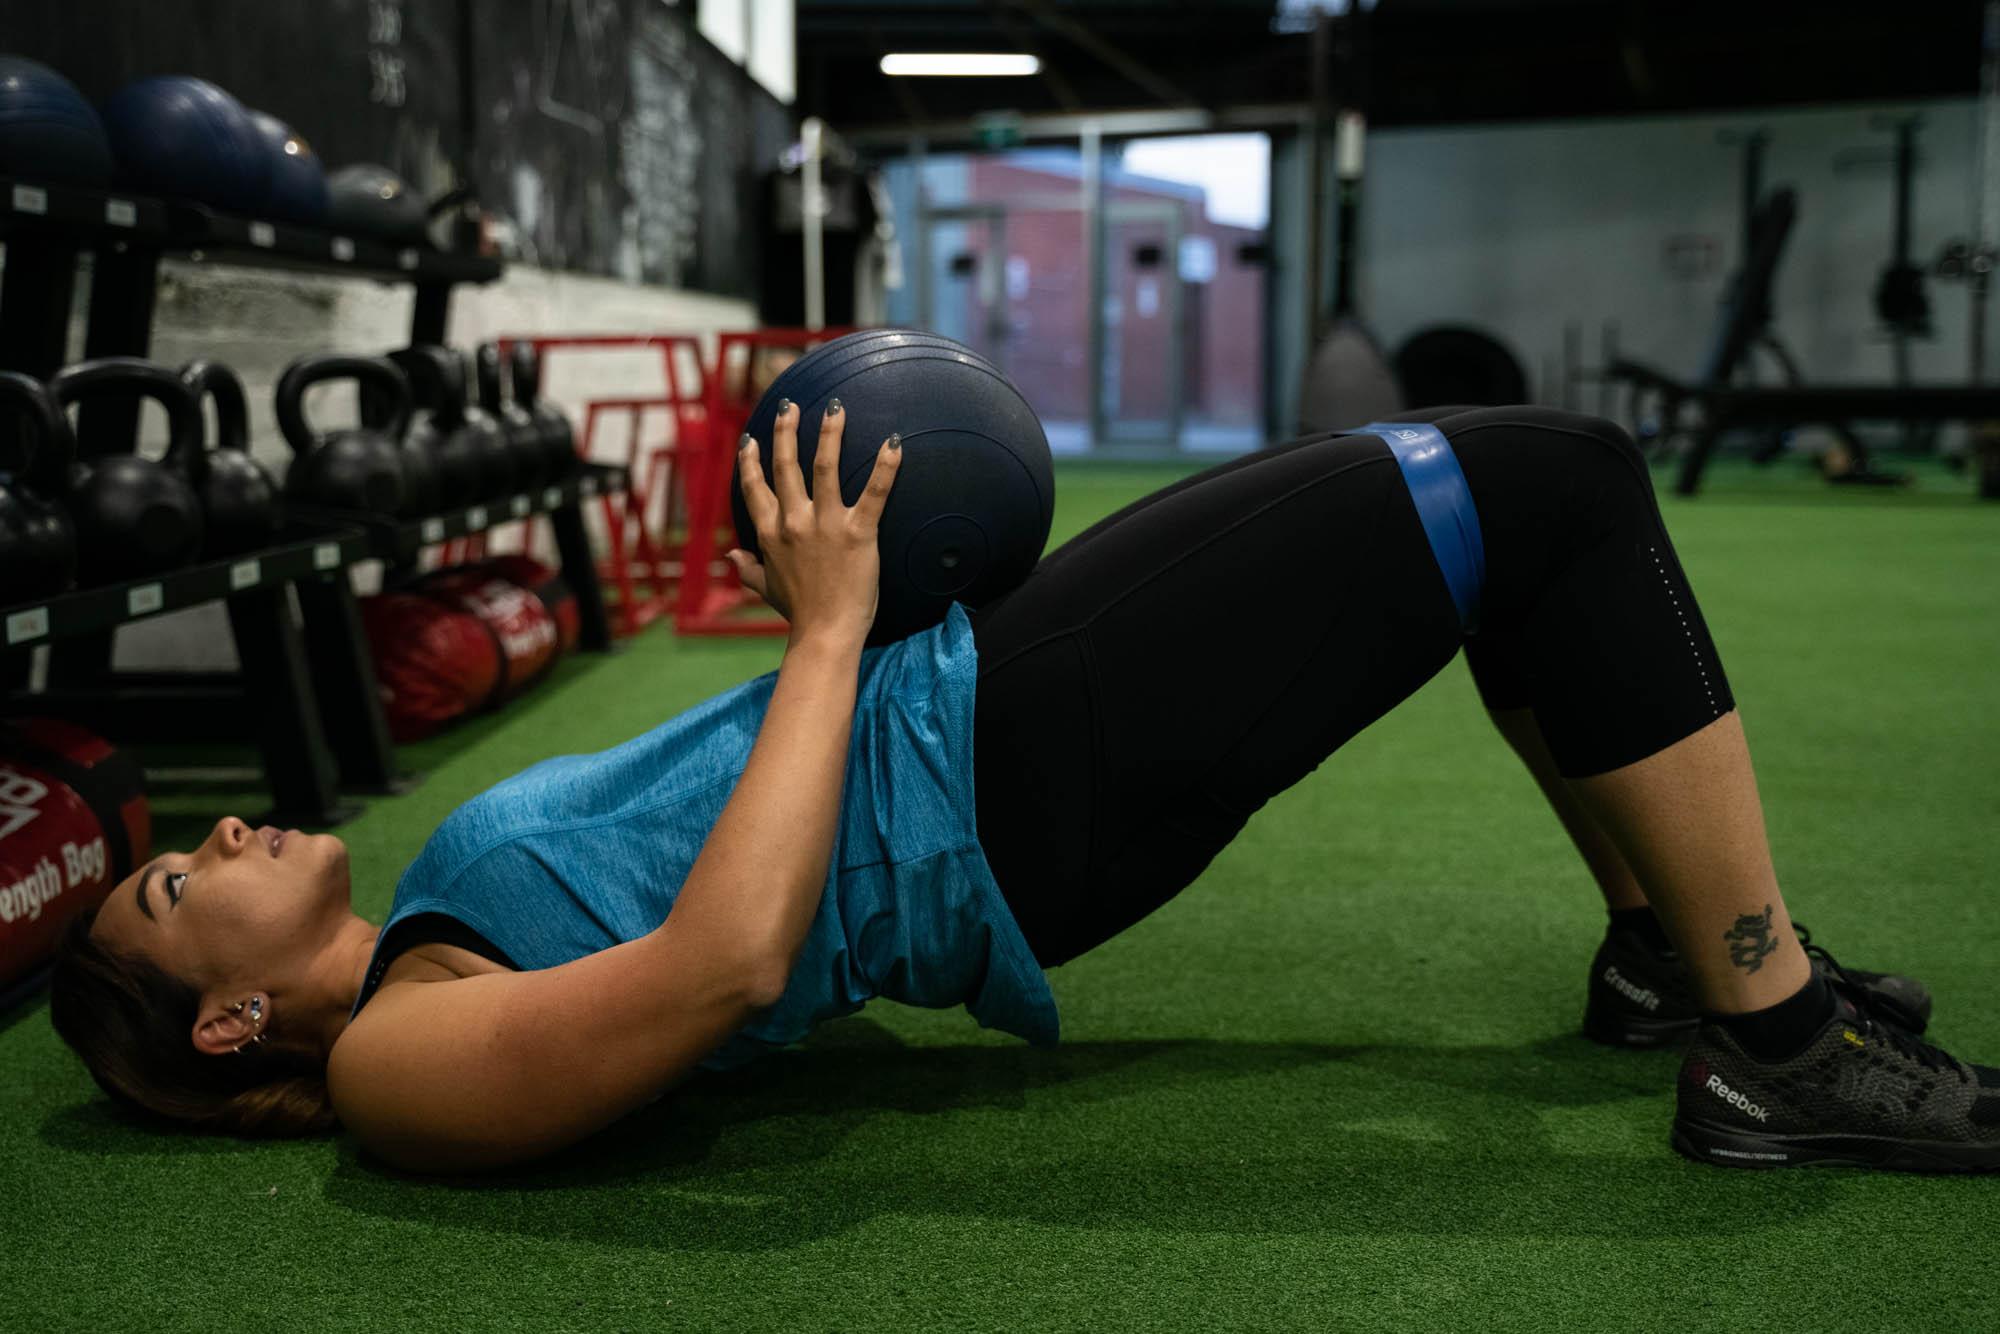 1. Band around knees hip thrust